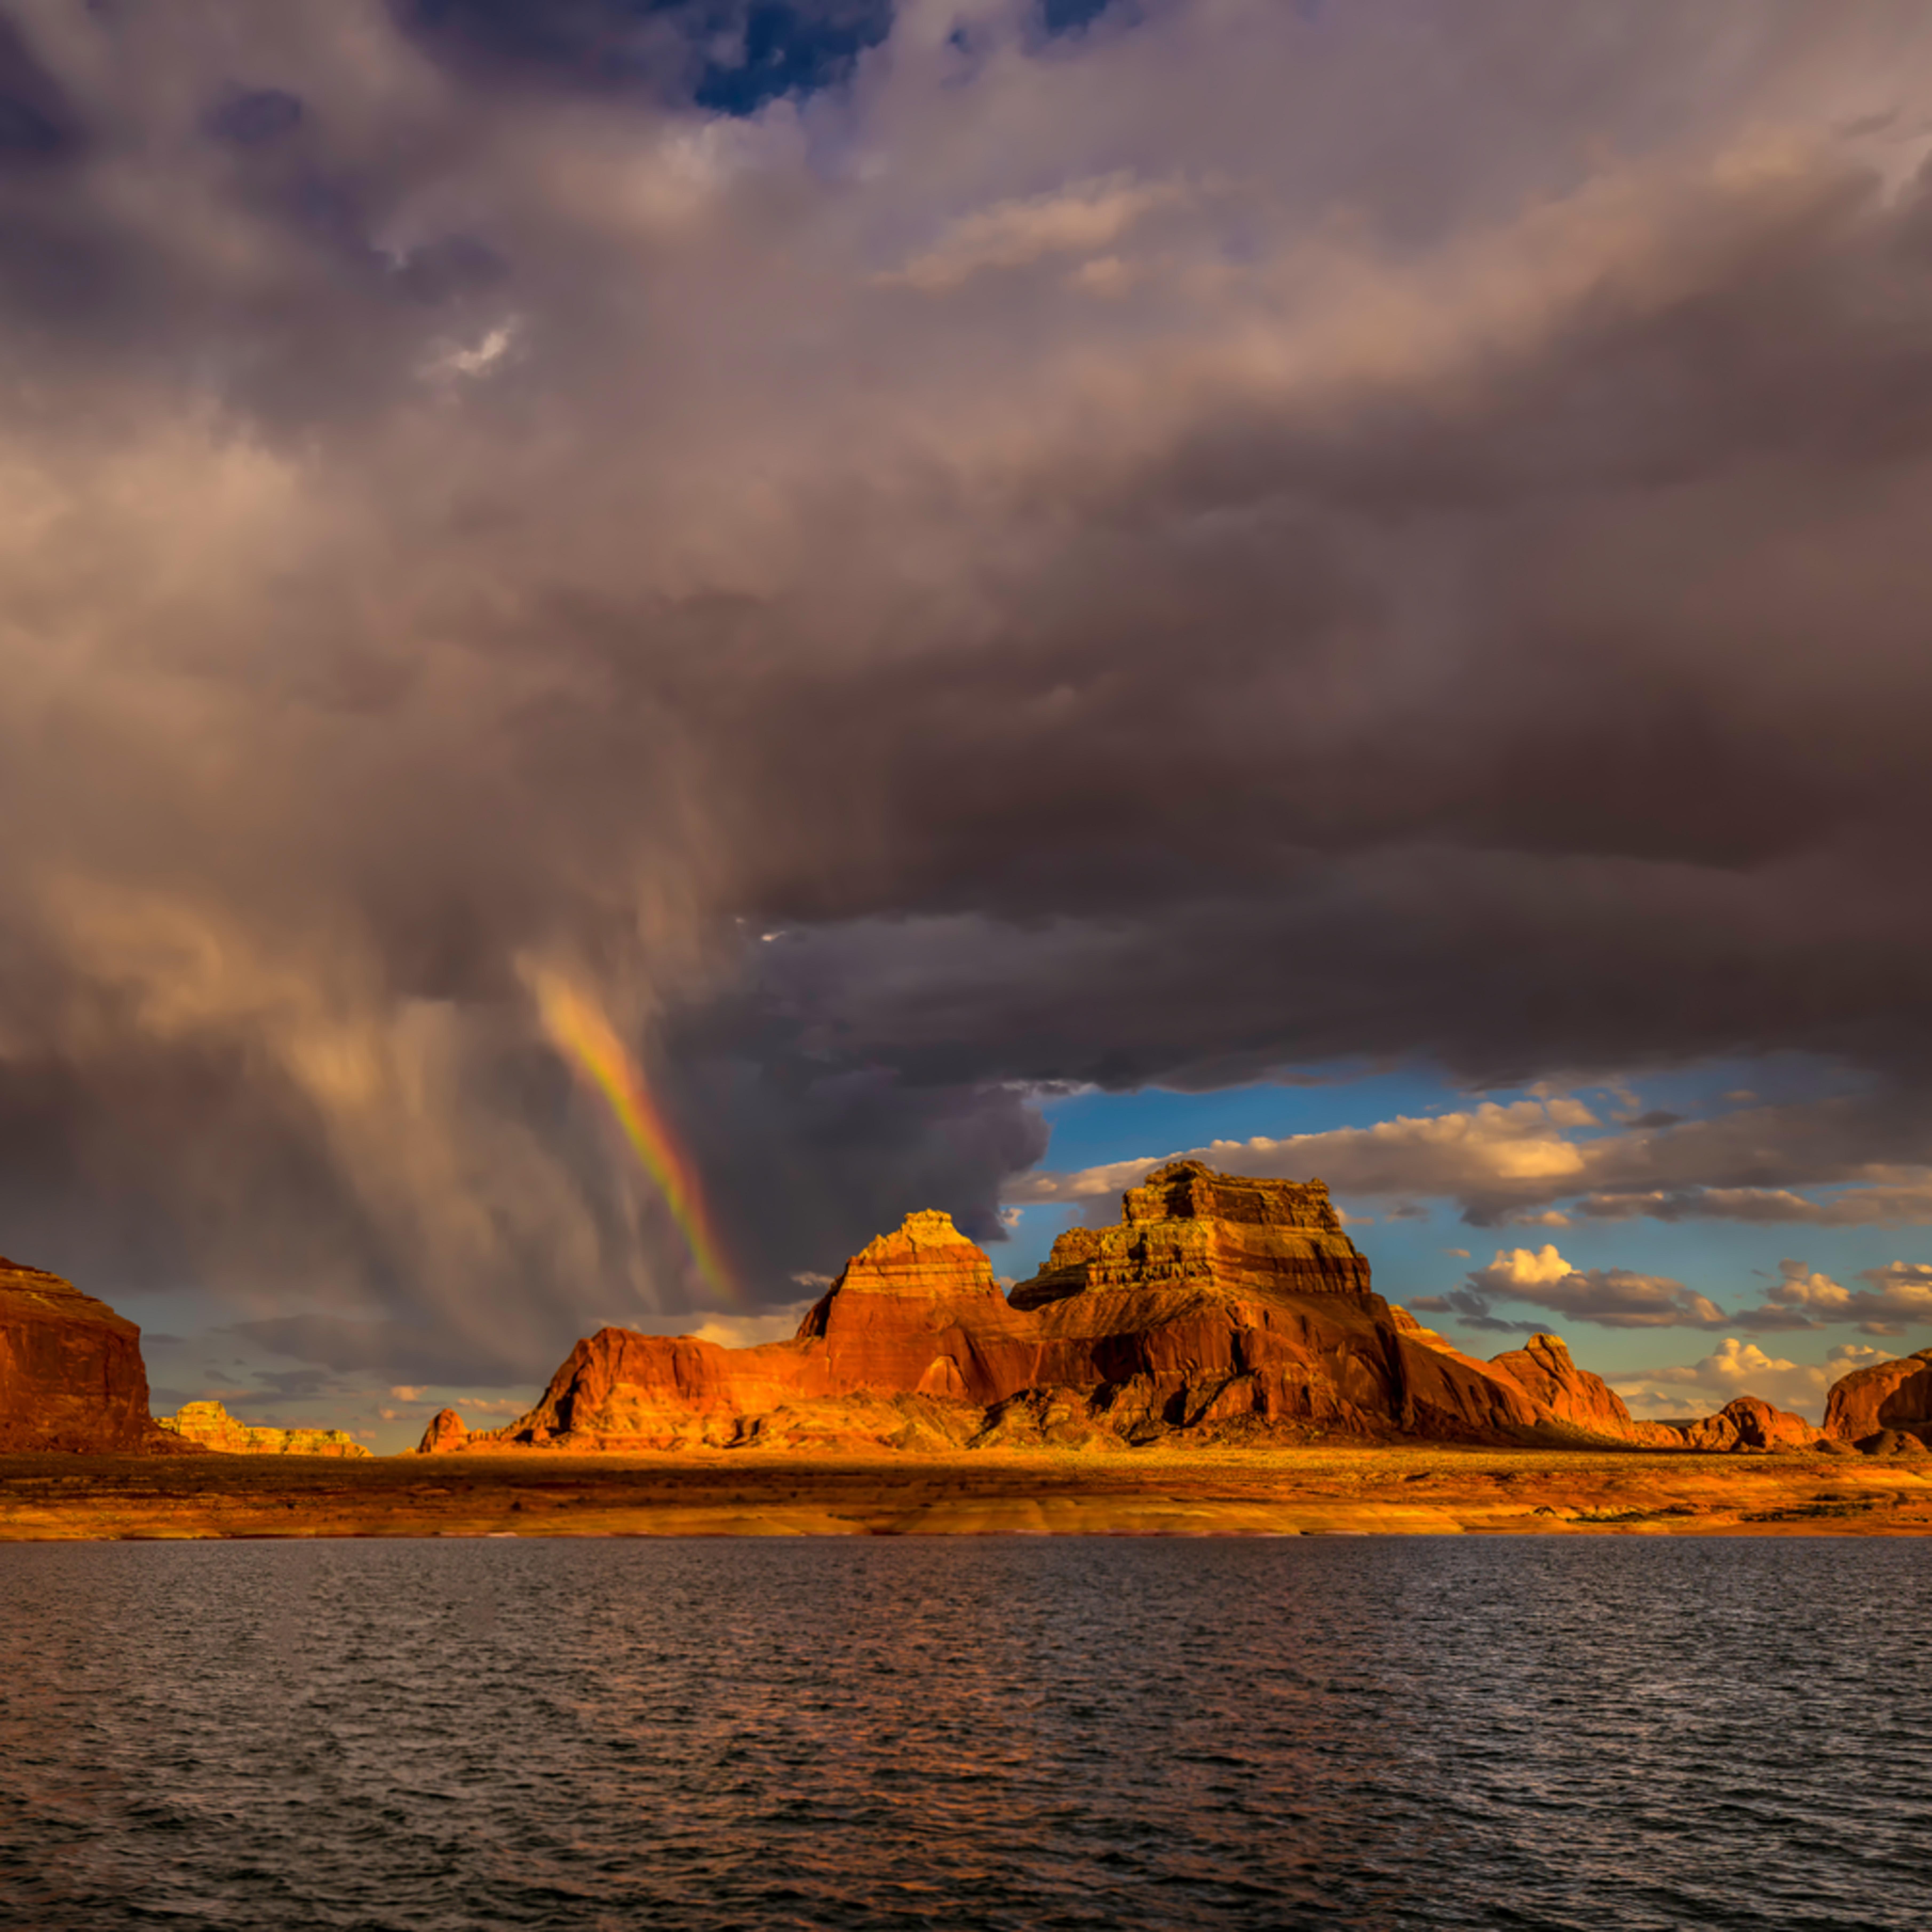 Lake powell rainbow 24x36 uveuui